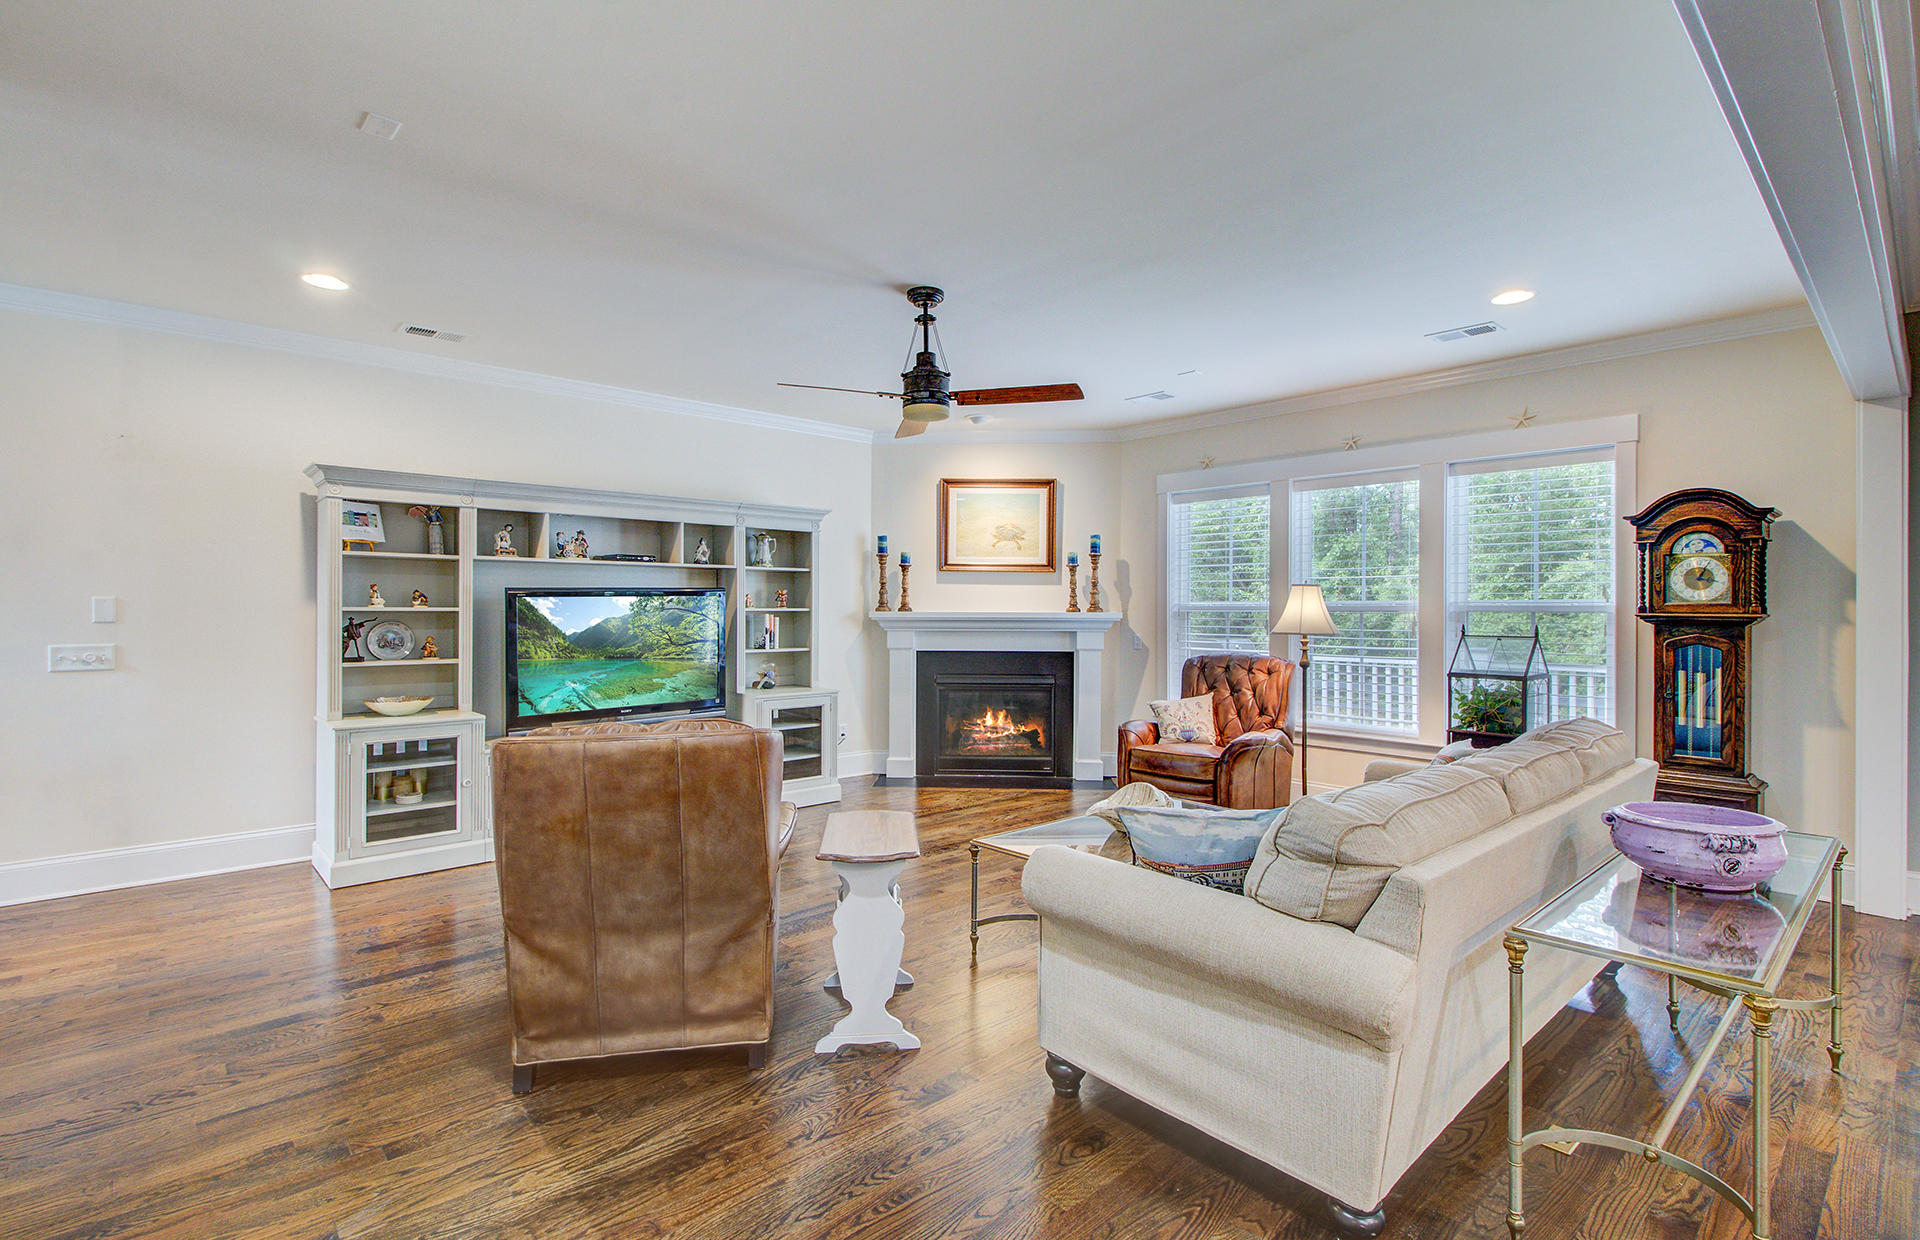 Scotts Creek Homes For Sale - 1404 Scotts Creek, Mount Pleasant, SC - 24